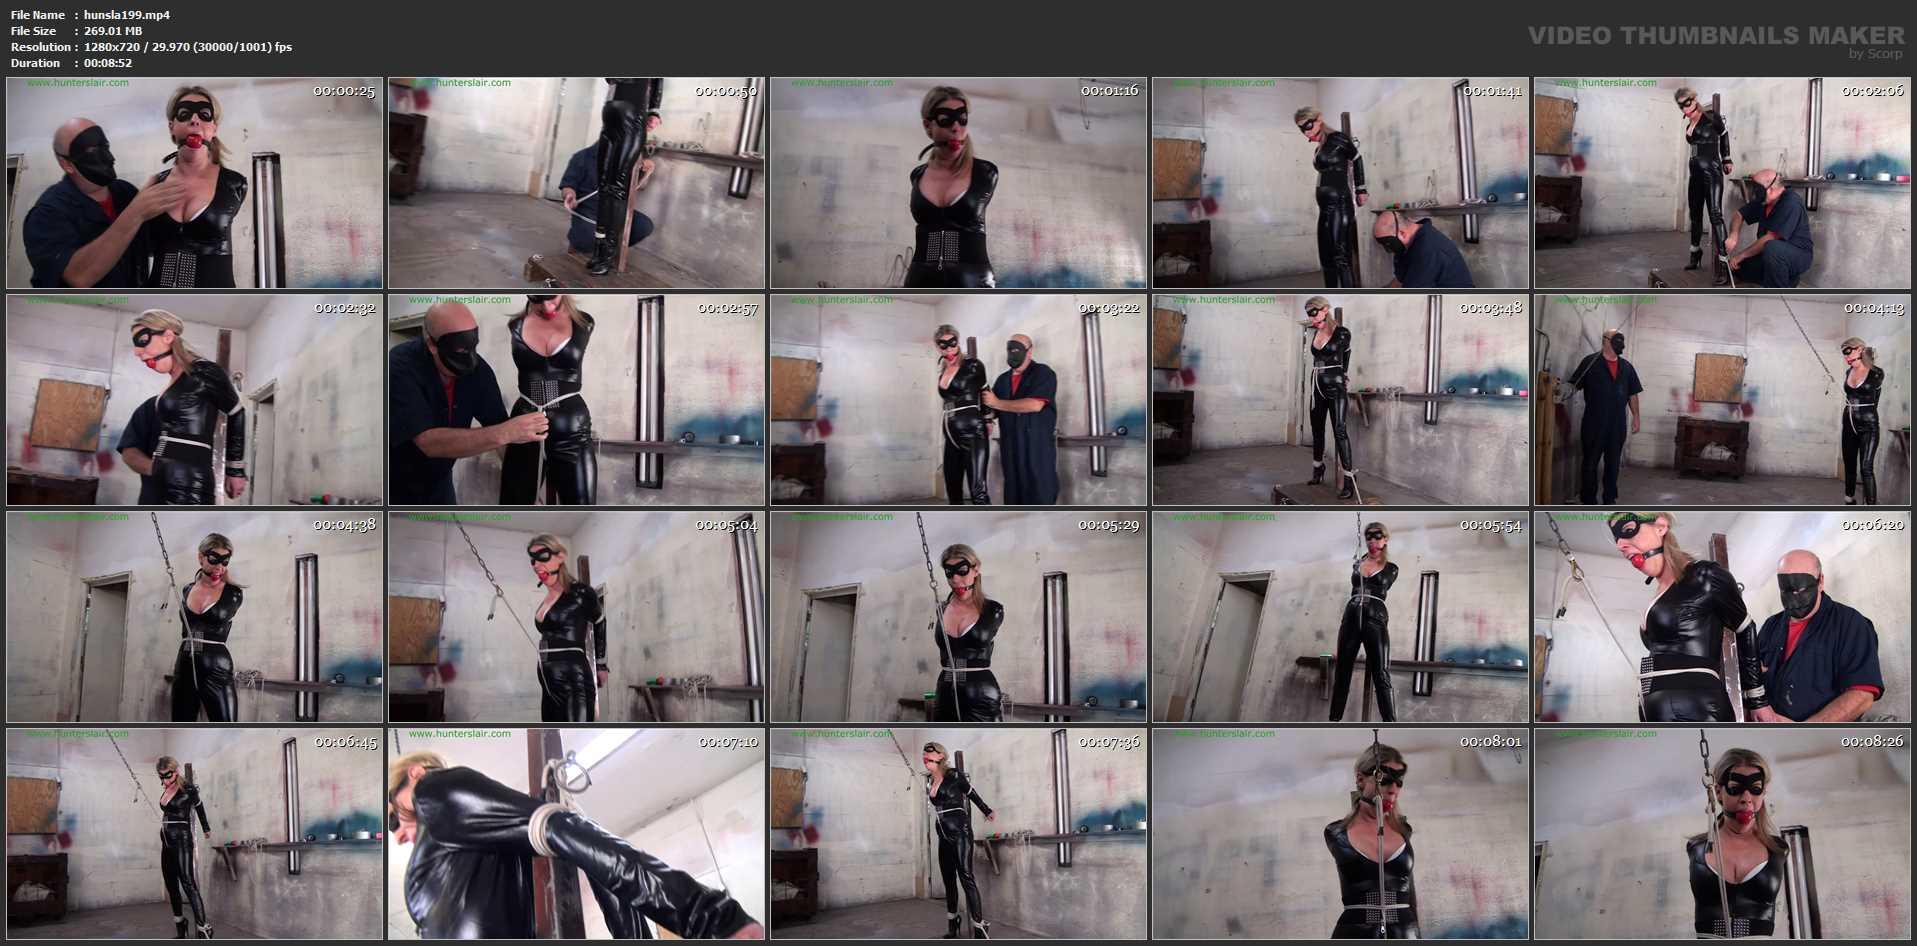 [HUNTERSLAIR] Crotch rope interrorgation. Featuring: Roxie Rae [HD][720p][MP4]